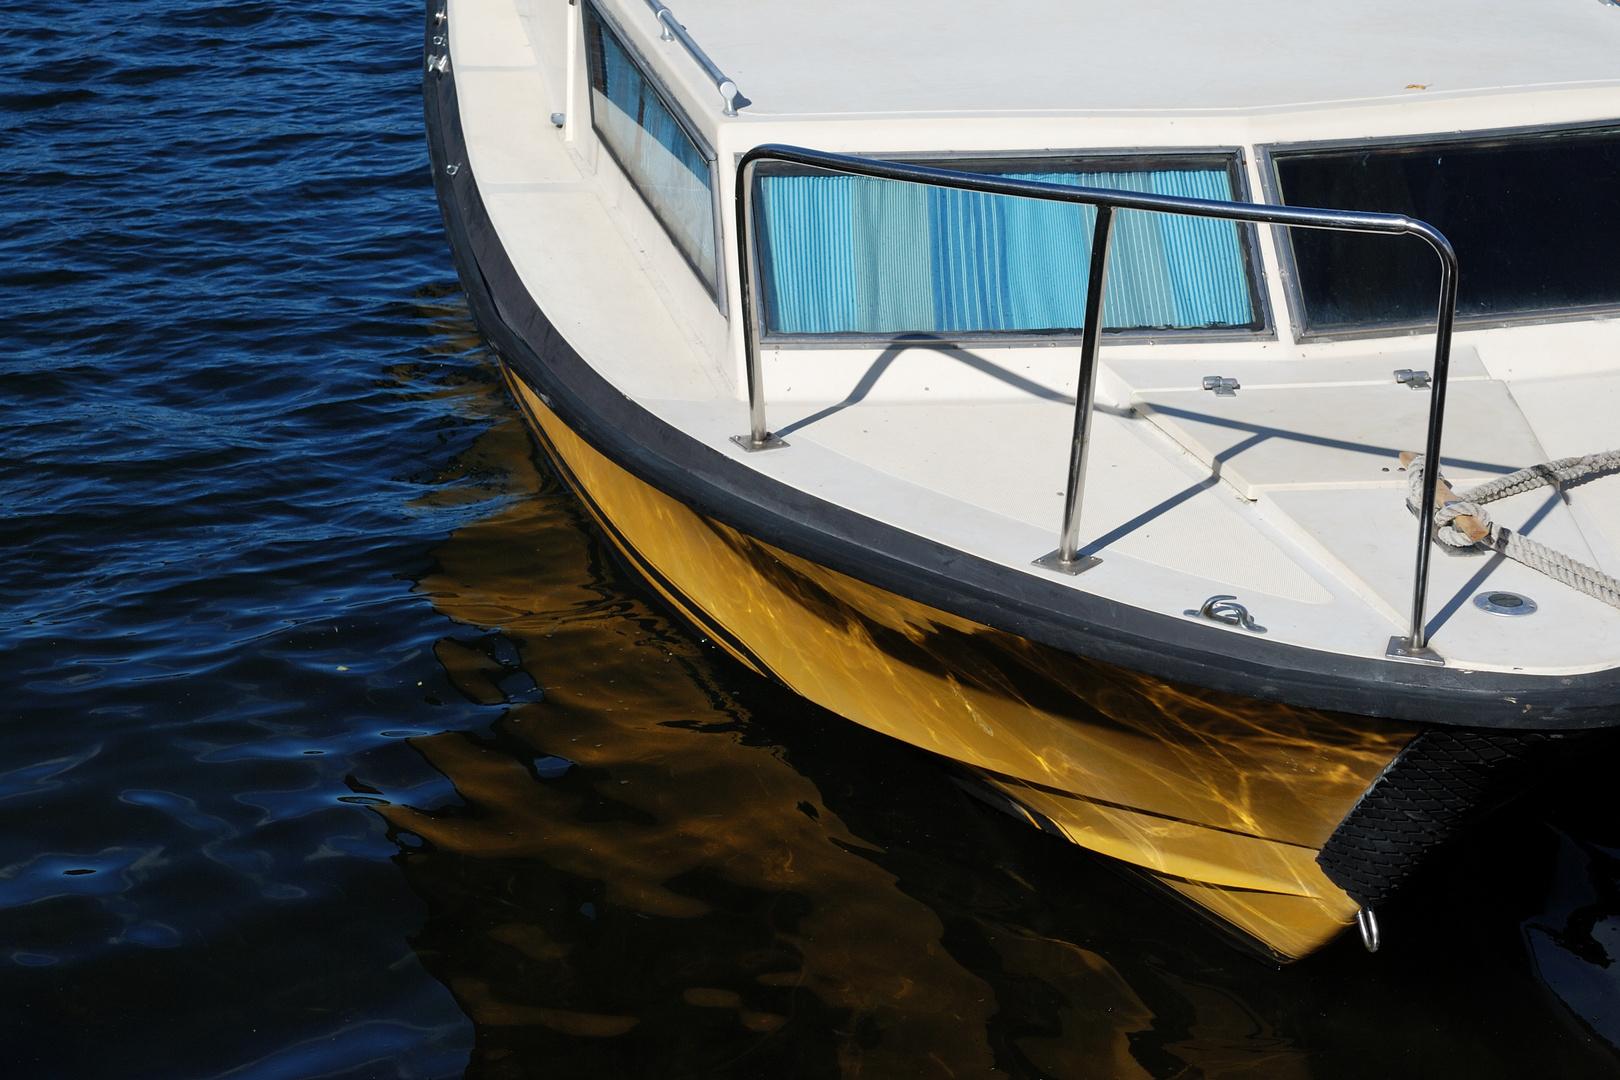 Motorboot mit blauen Gardienen